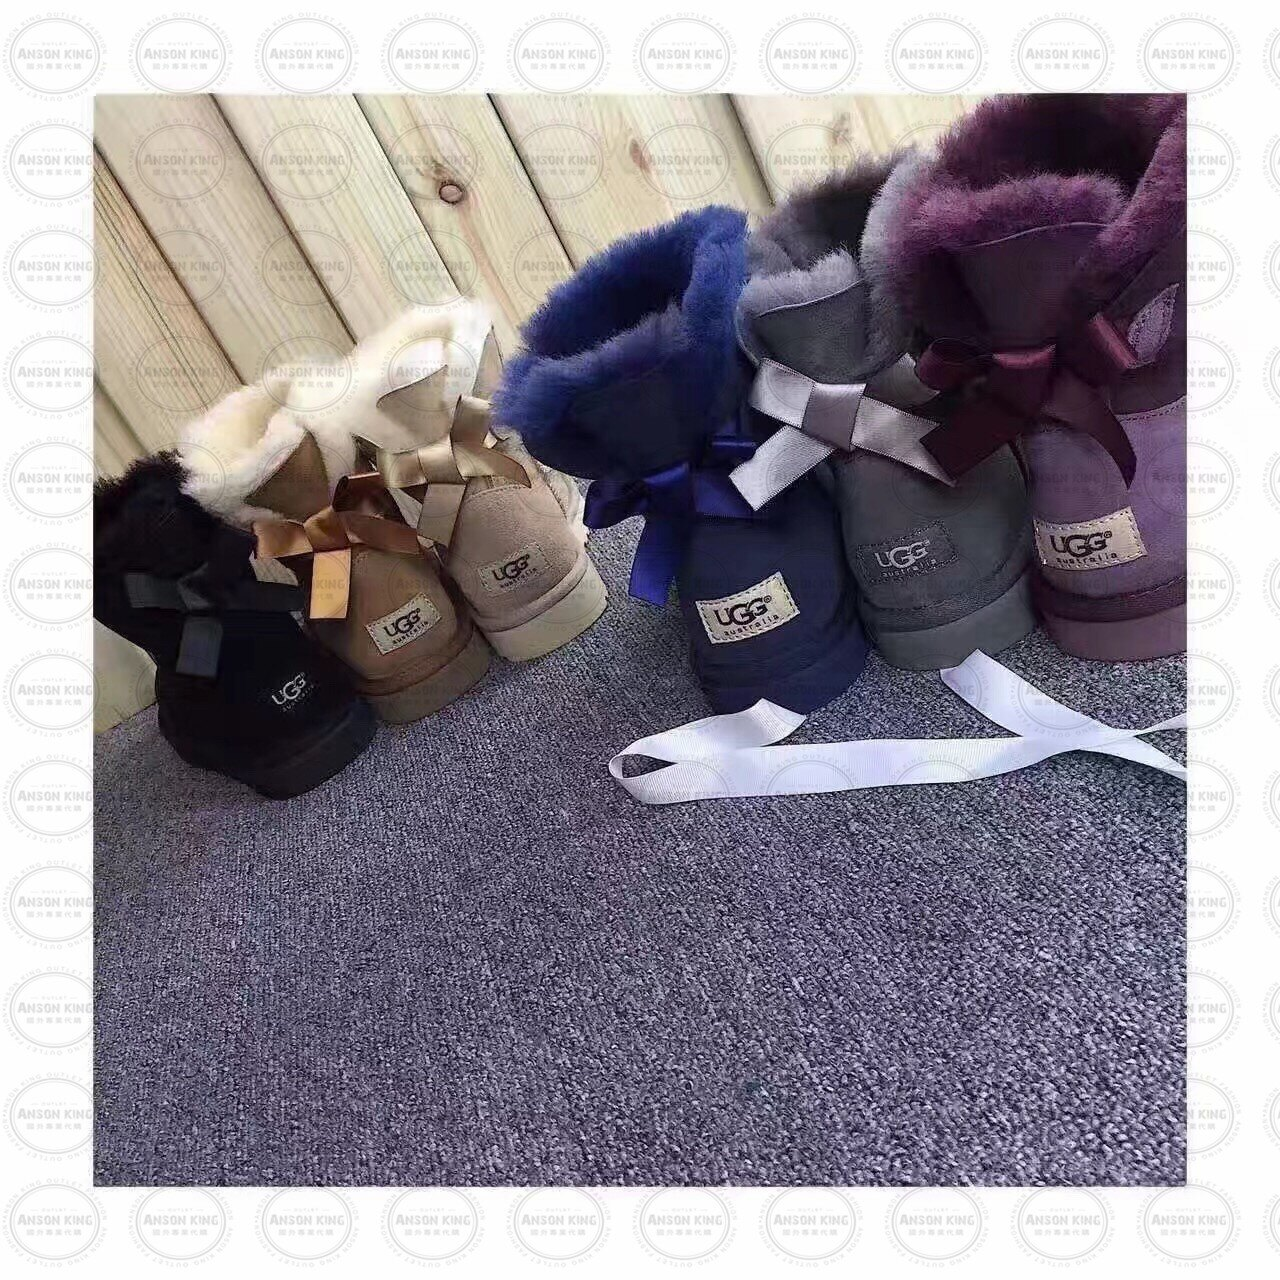 OUTLET正品代購 澳洲 UGG 單蝴蝶結羊皮毛一體 中長靴 保暖 真皮羊皮毛 雪靴 短靴 紫色 1